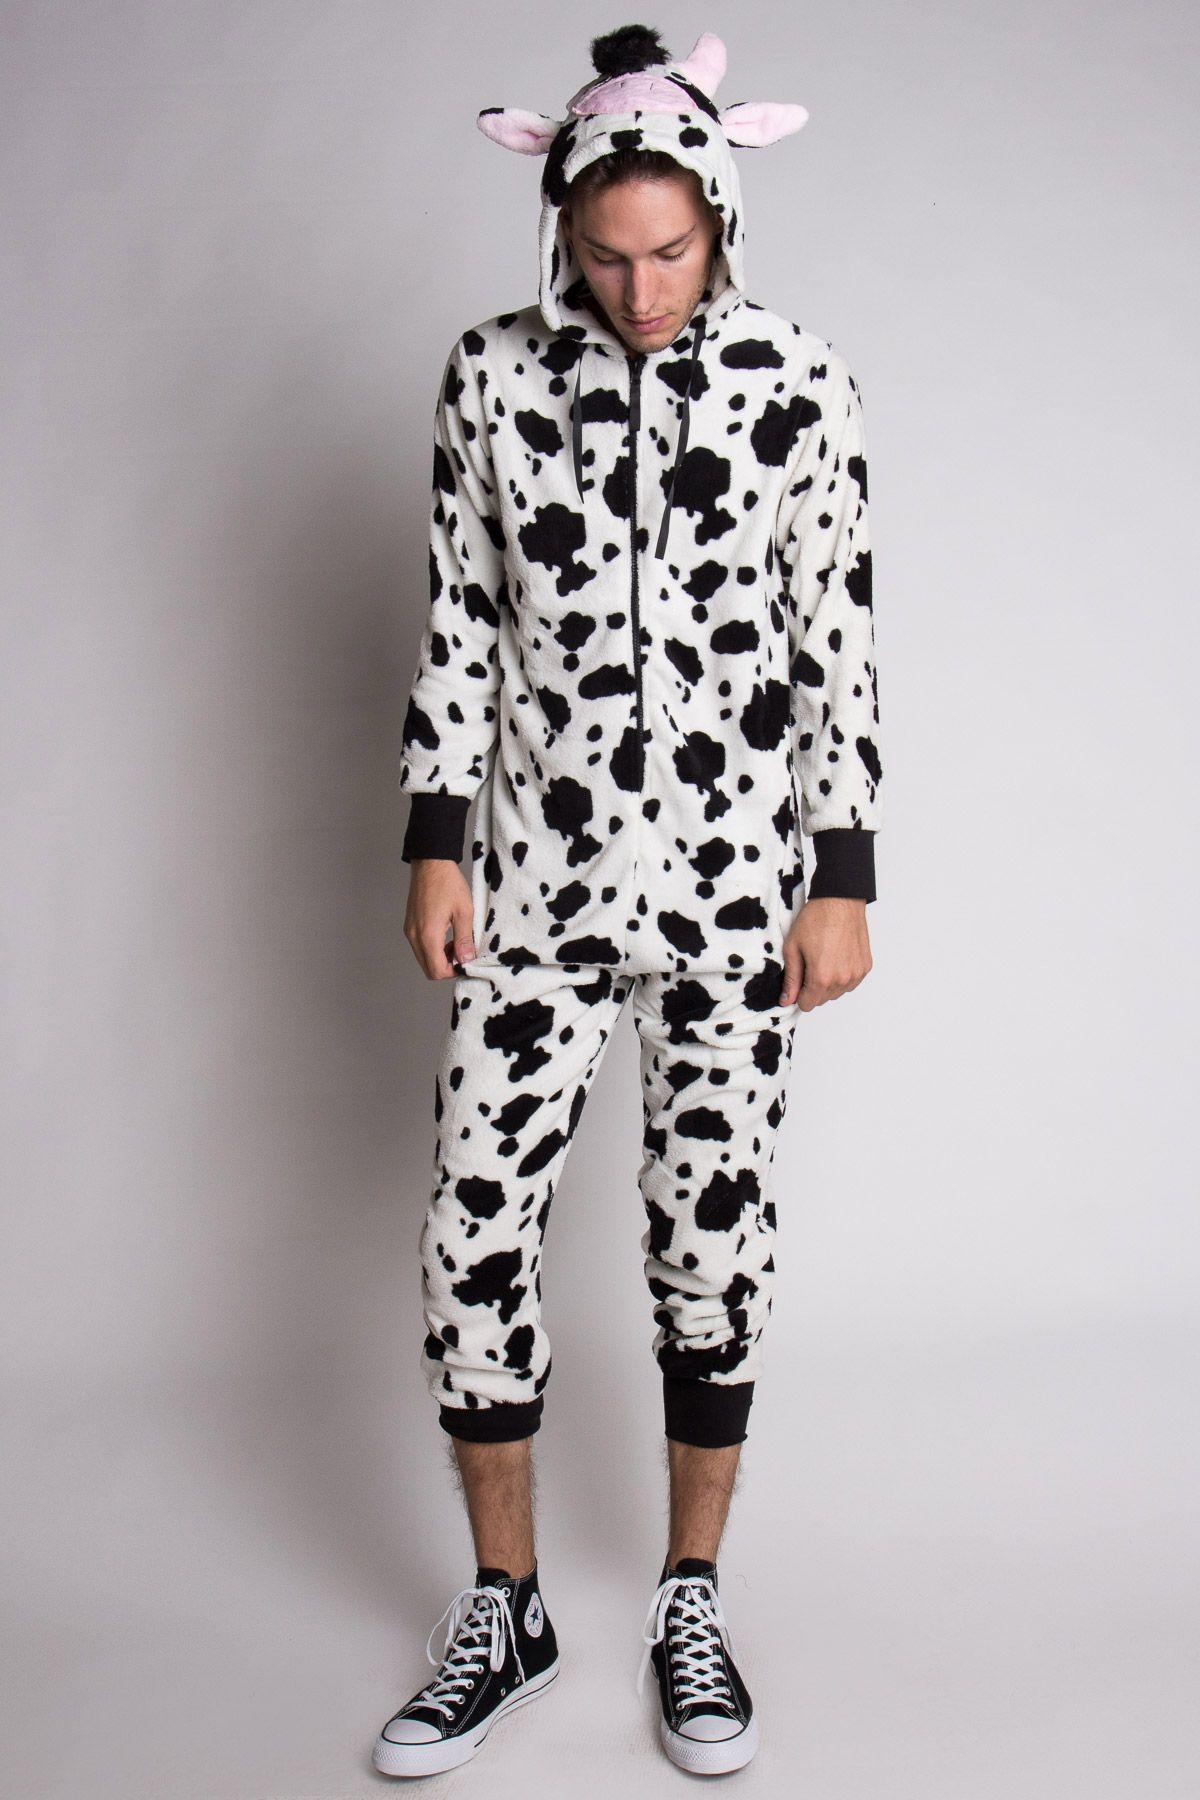 25dcc80cc6b Mooooo Says the cow! Cow Onesie Pajamas -  29.99